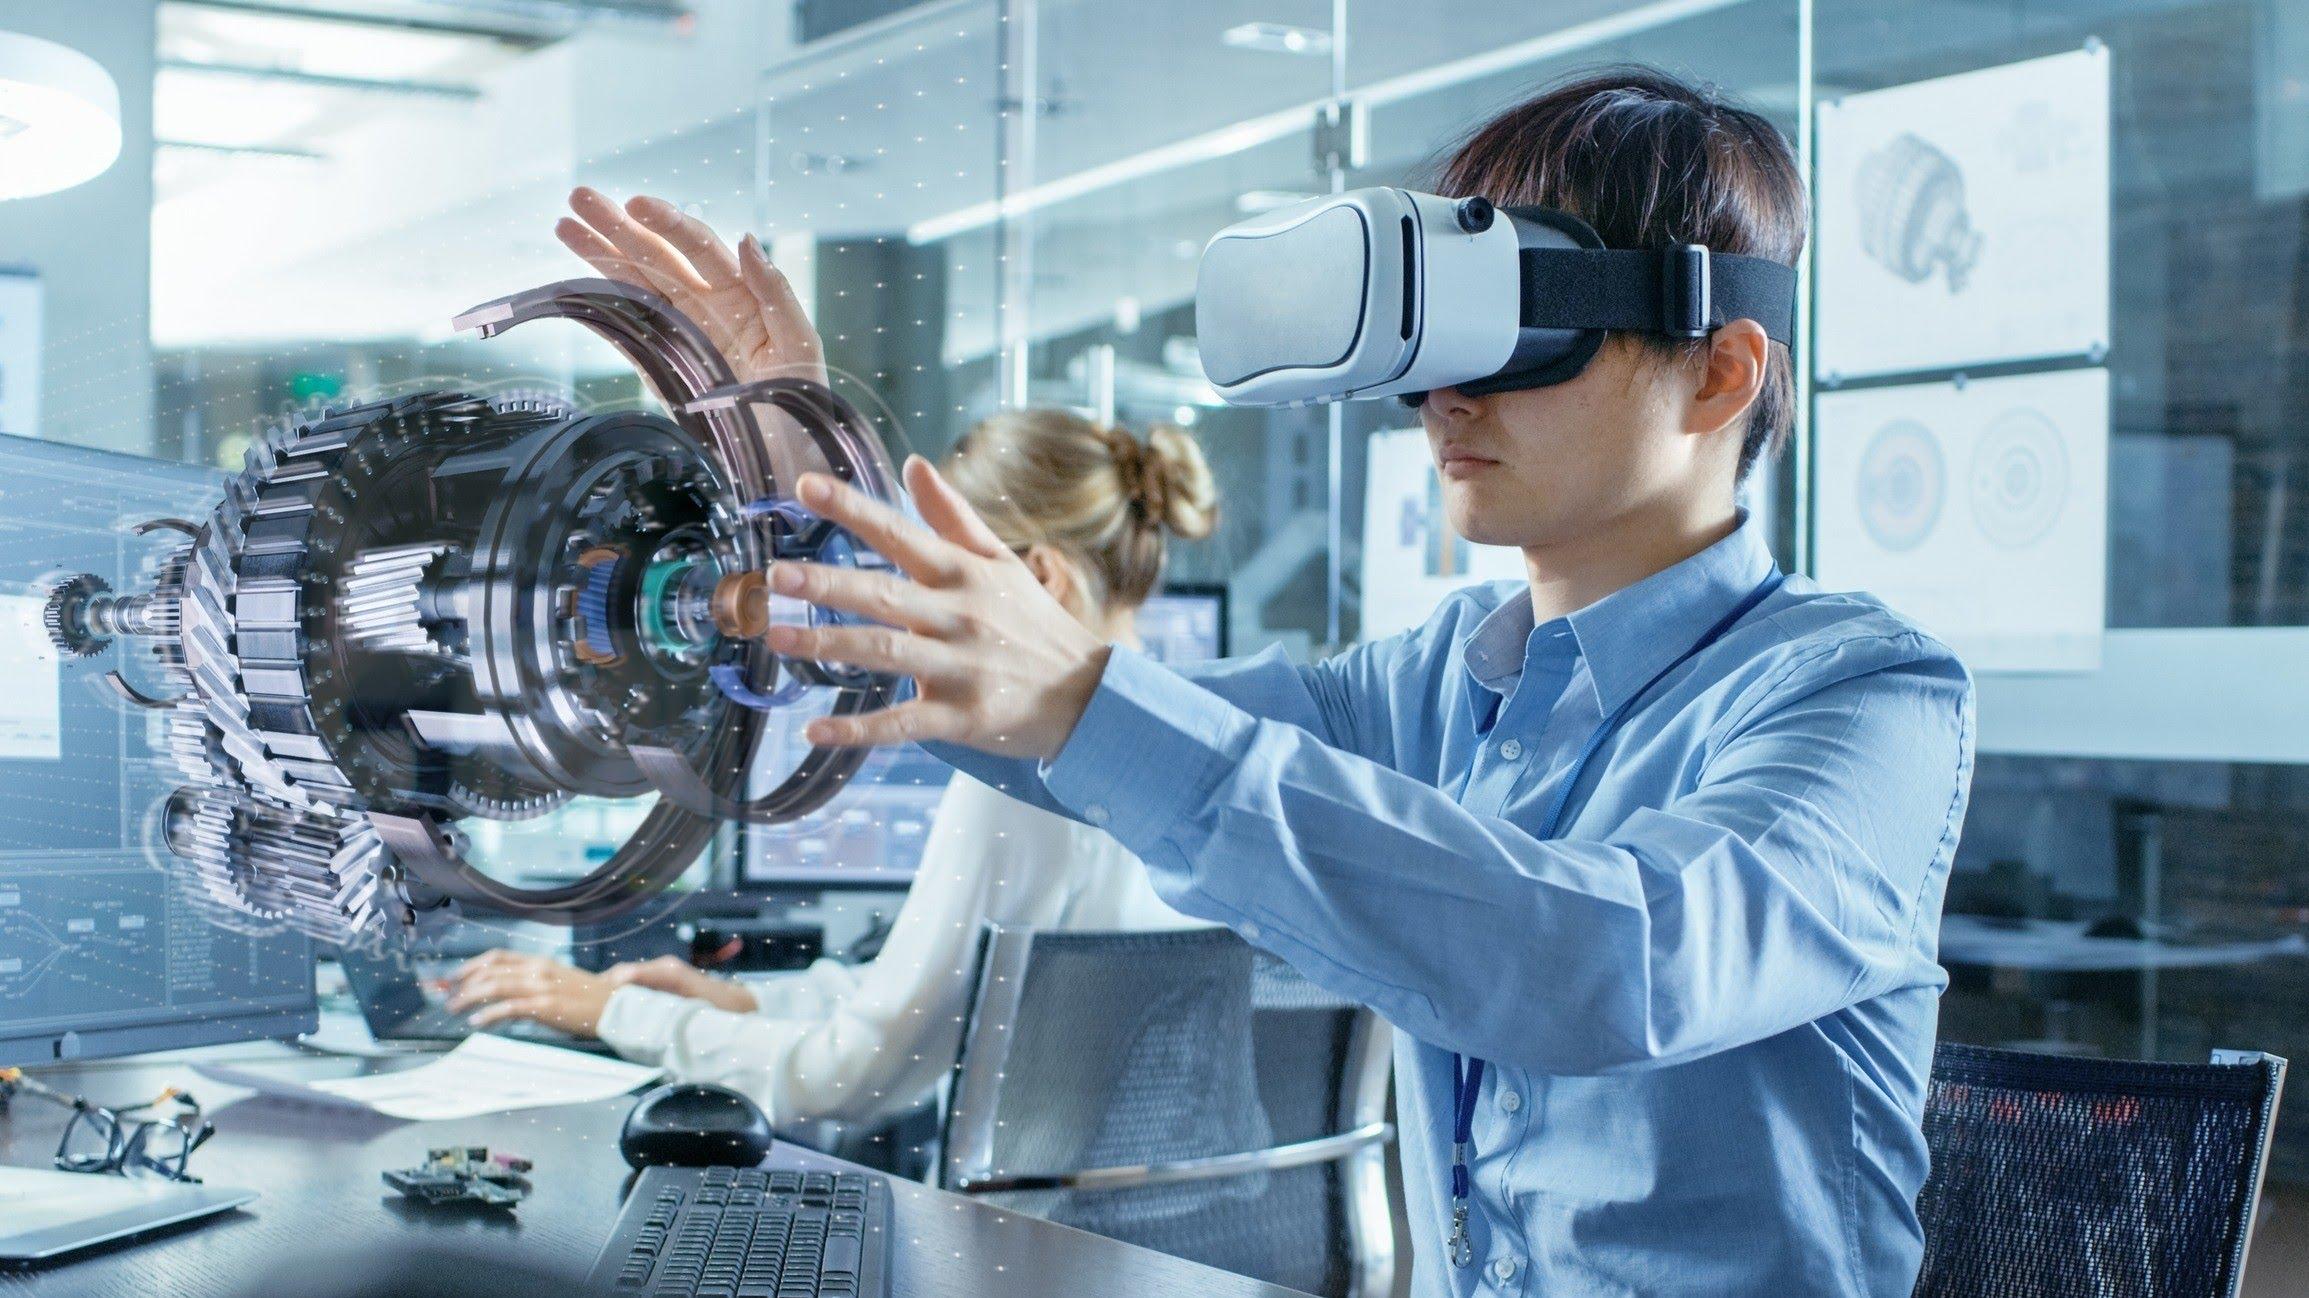 https://digital.gov/topics/augmented-reality/